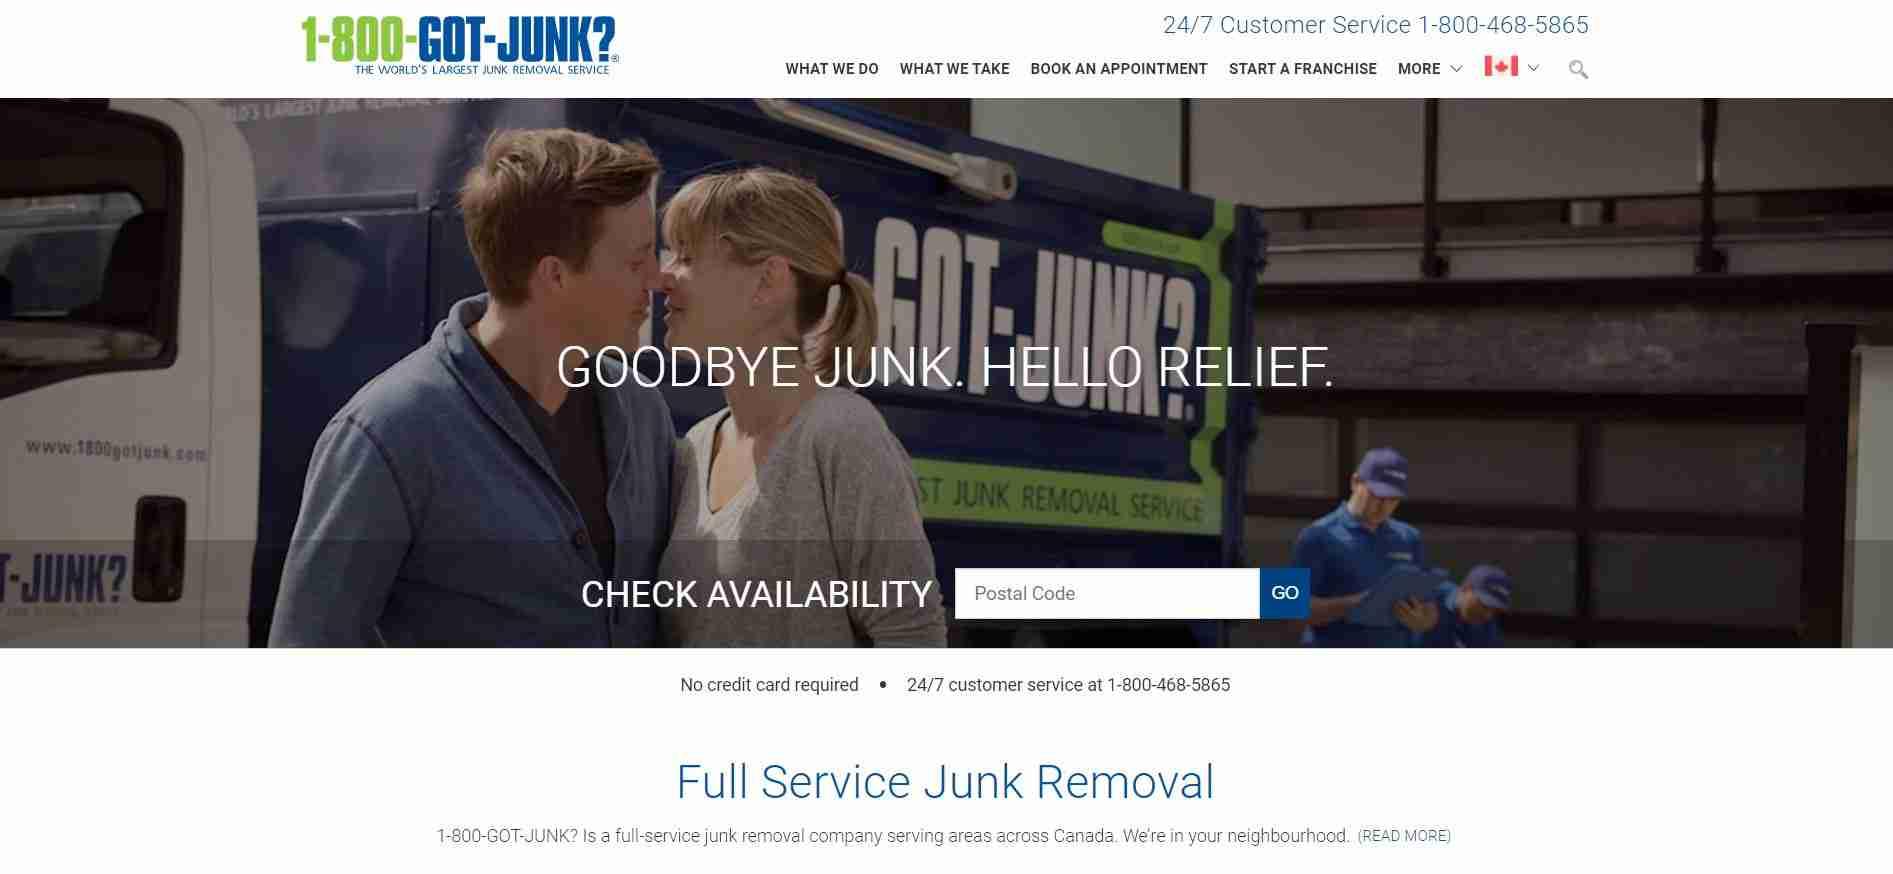 1-800-Got-Junk's? Homepage